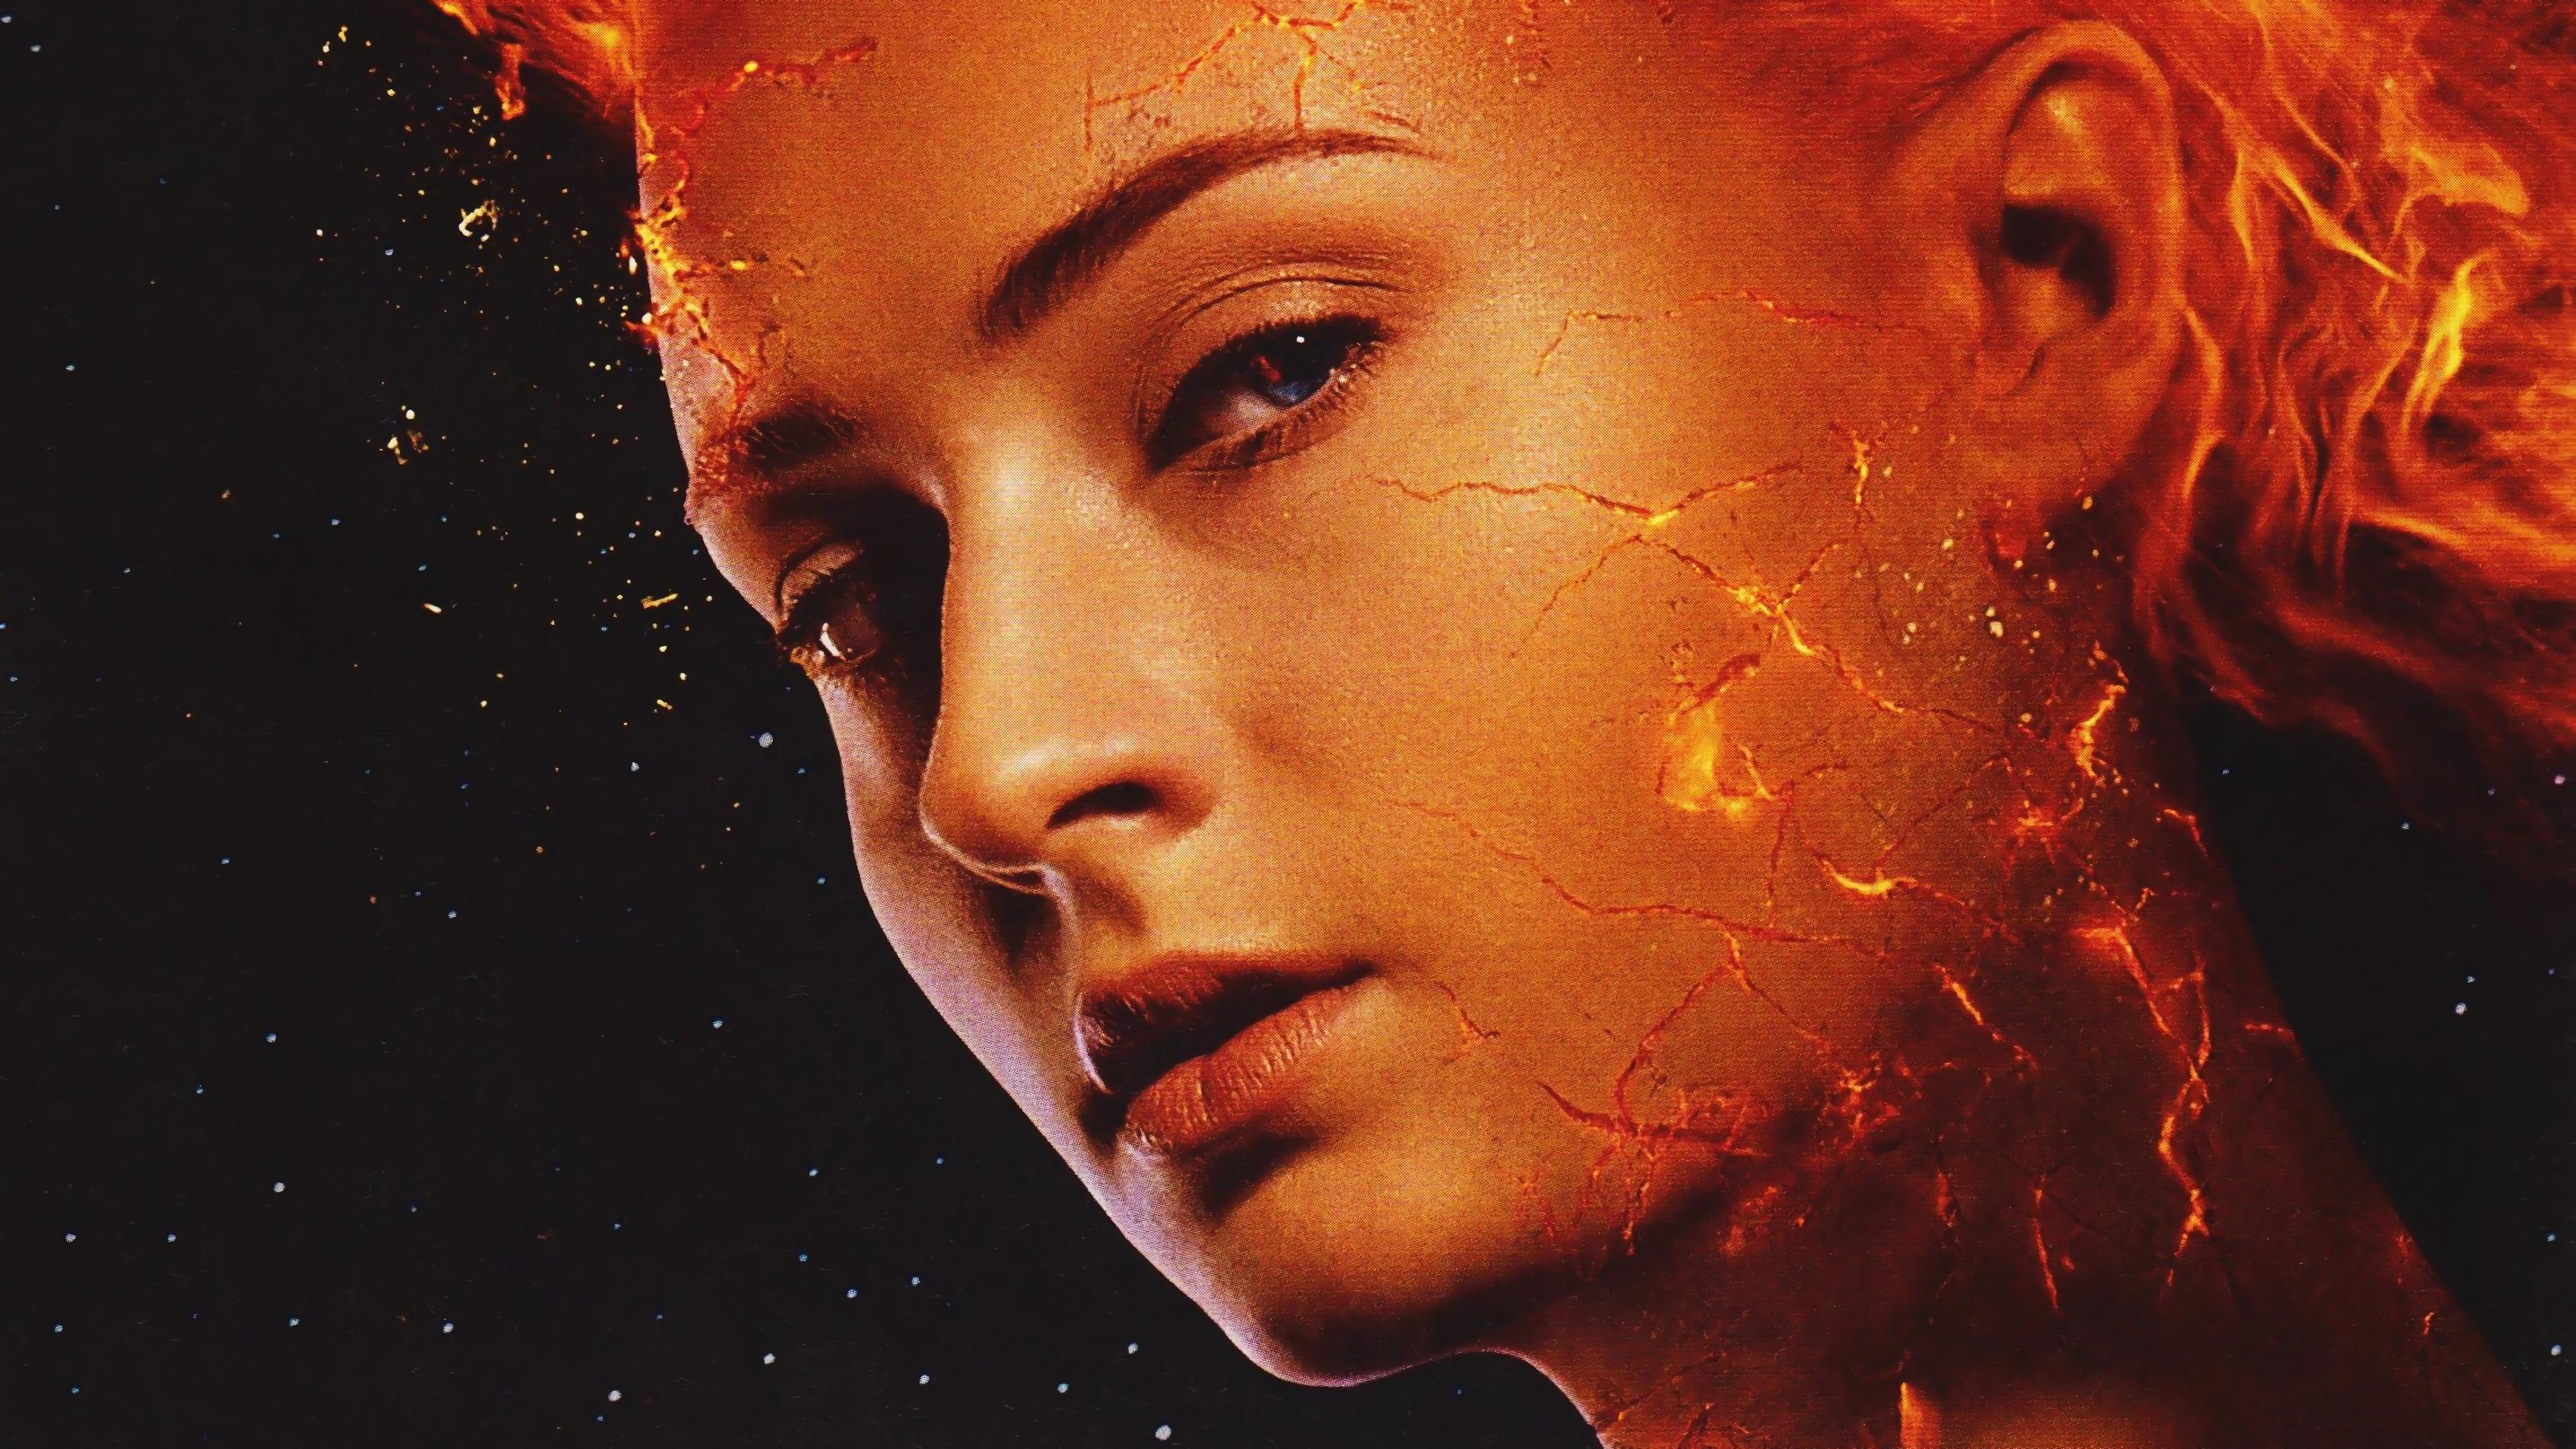 x men dark phoenix movie 2019 sophie turner 1547507025 - X-Men: Dark Phoenix Movie 2019 Sophie Turner - X-Men: Dark Phoenix, Jean Grey